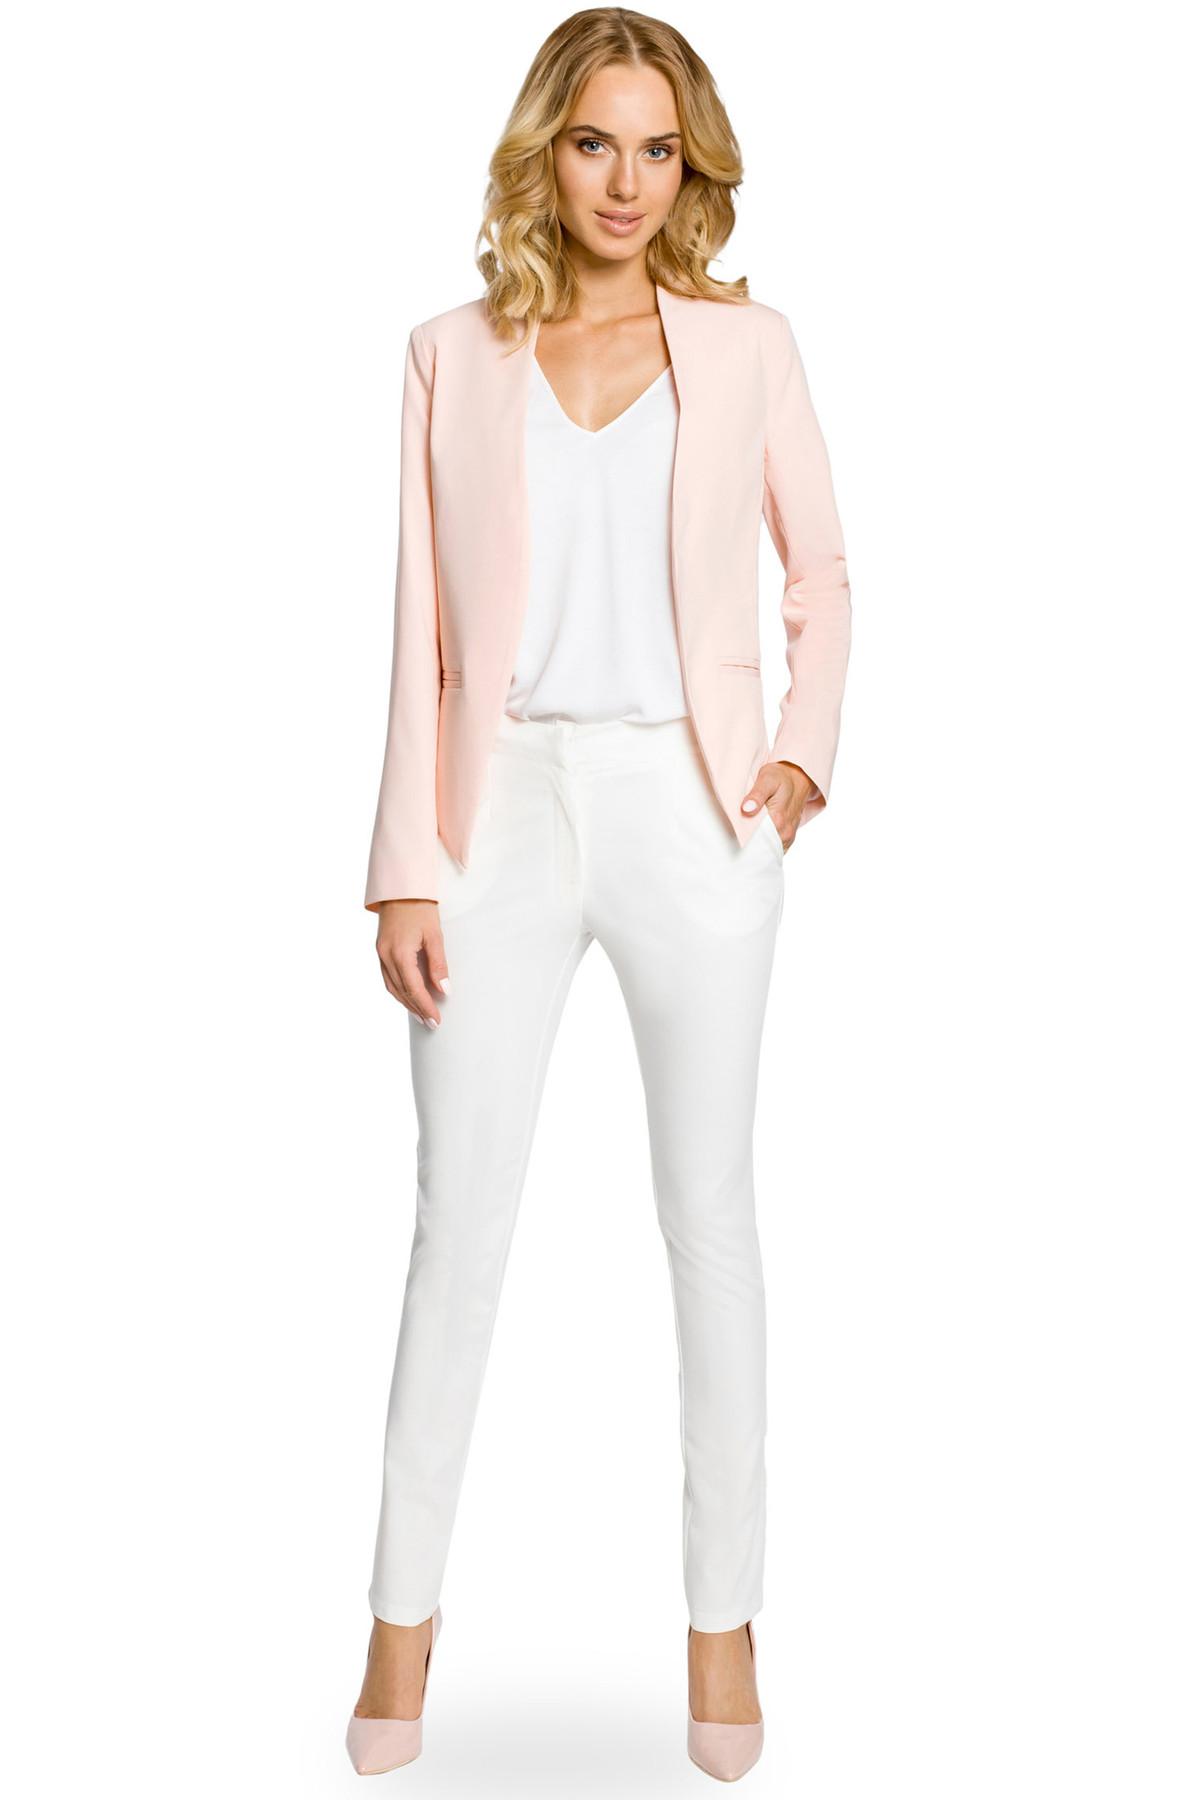 Clea Business Jacke Blazer Sakko Sacco Damenjacke Damenblazer in ...